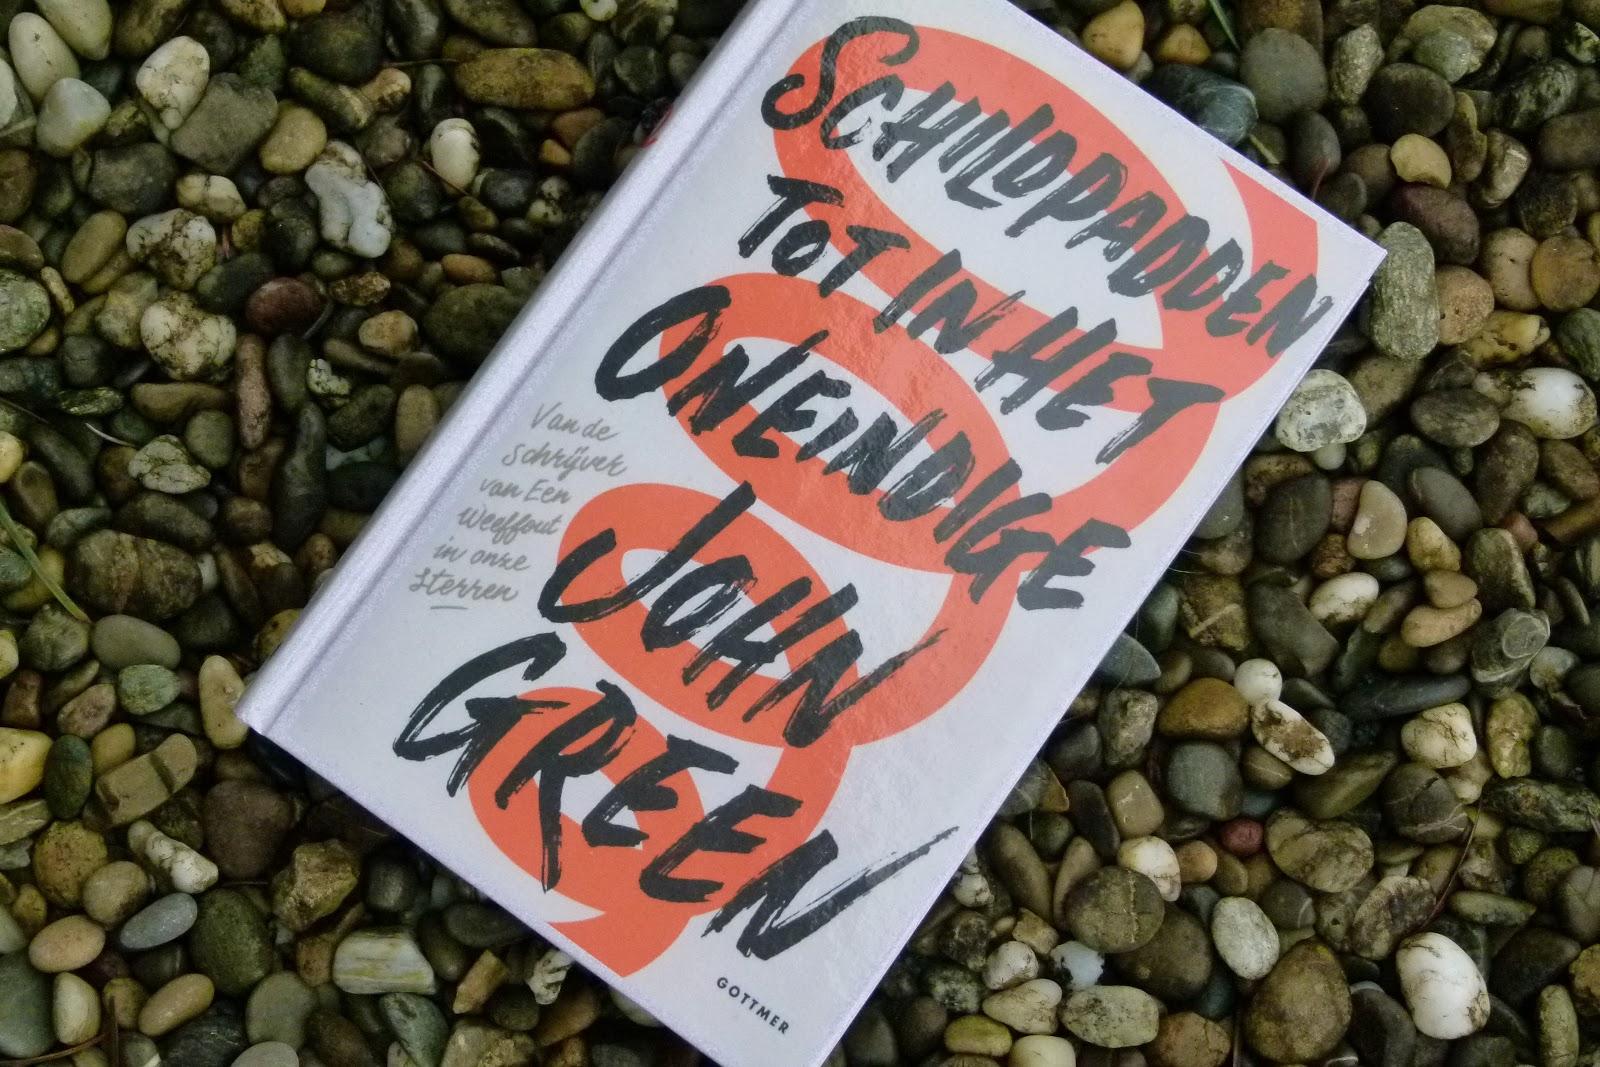 Nienkes Lifestyle Over Het Nieuwe Boek Van John Green